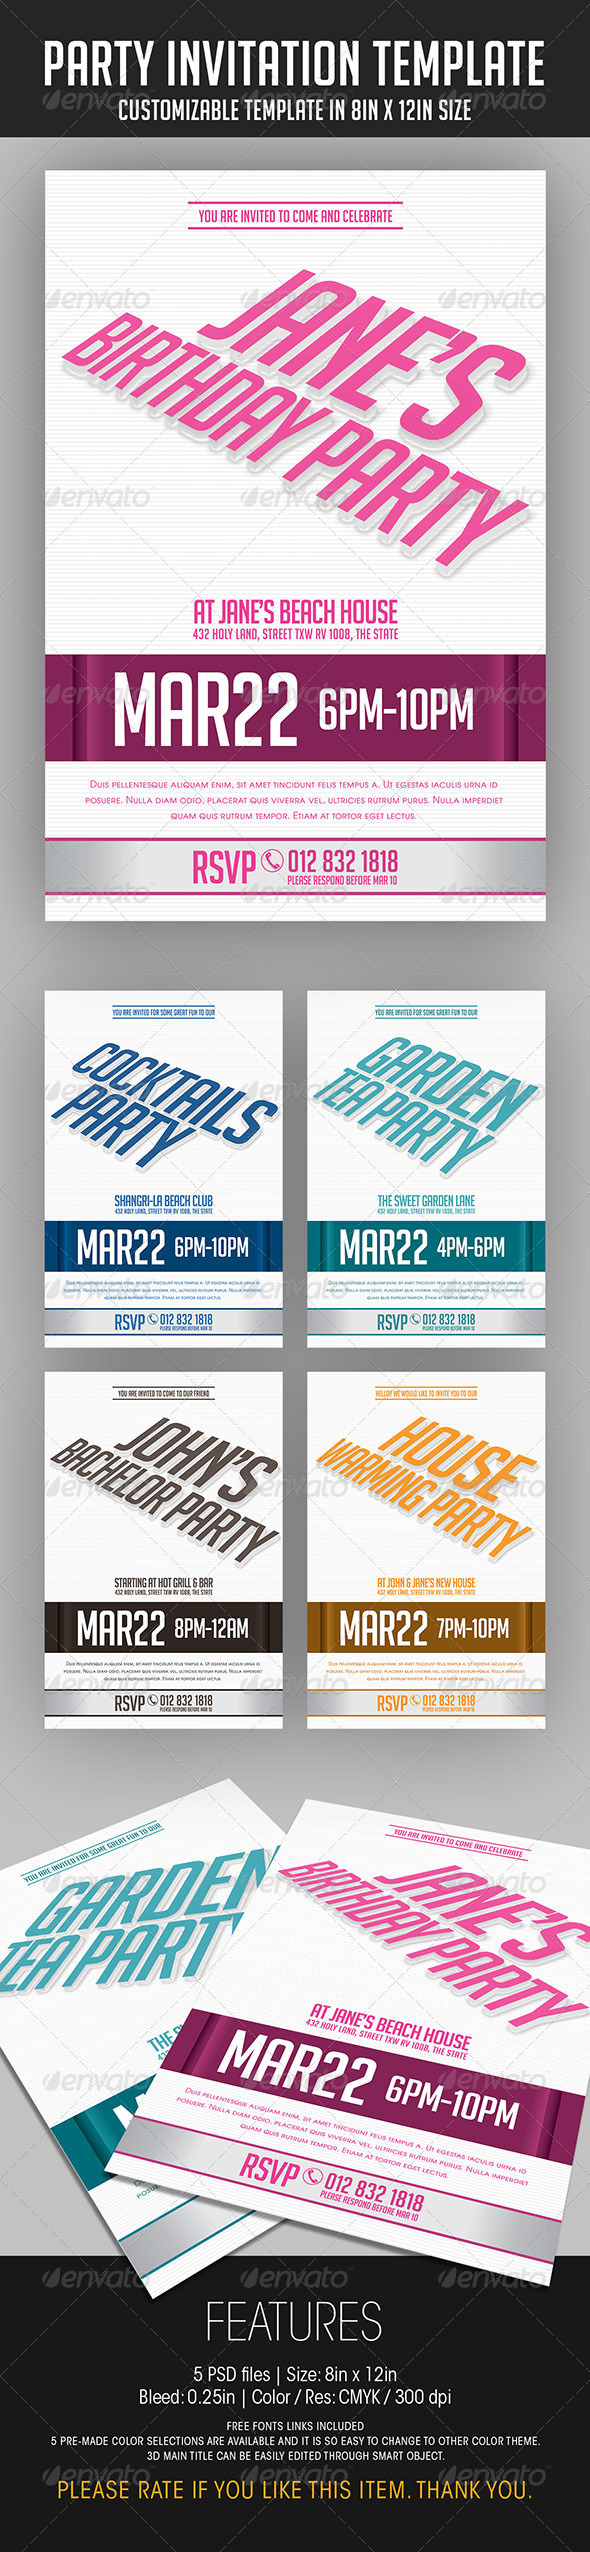 Party Invitation Template - Invitations Cards & Invites